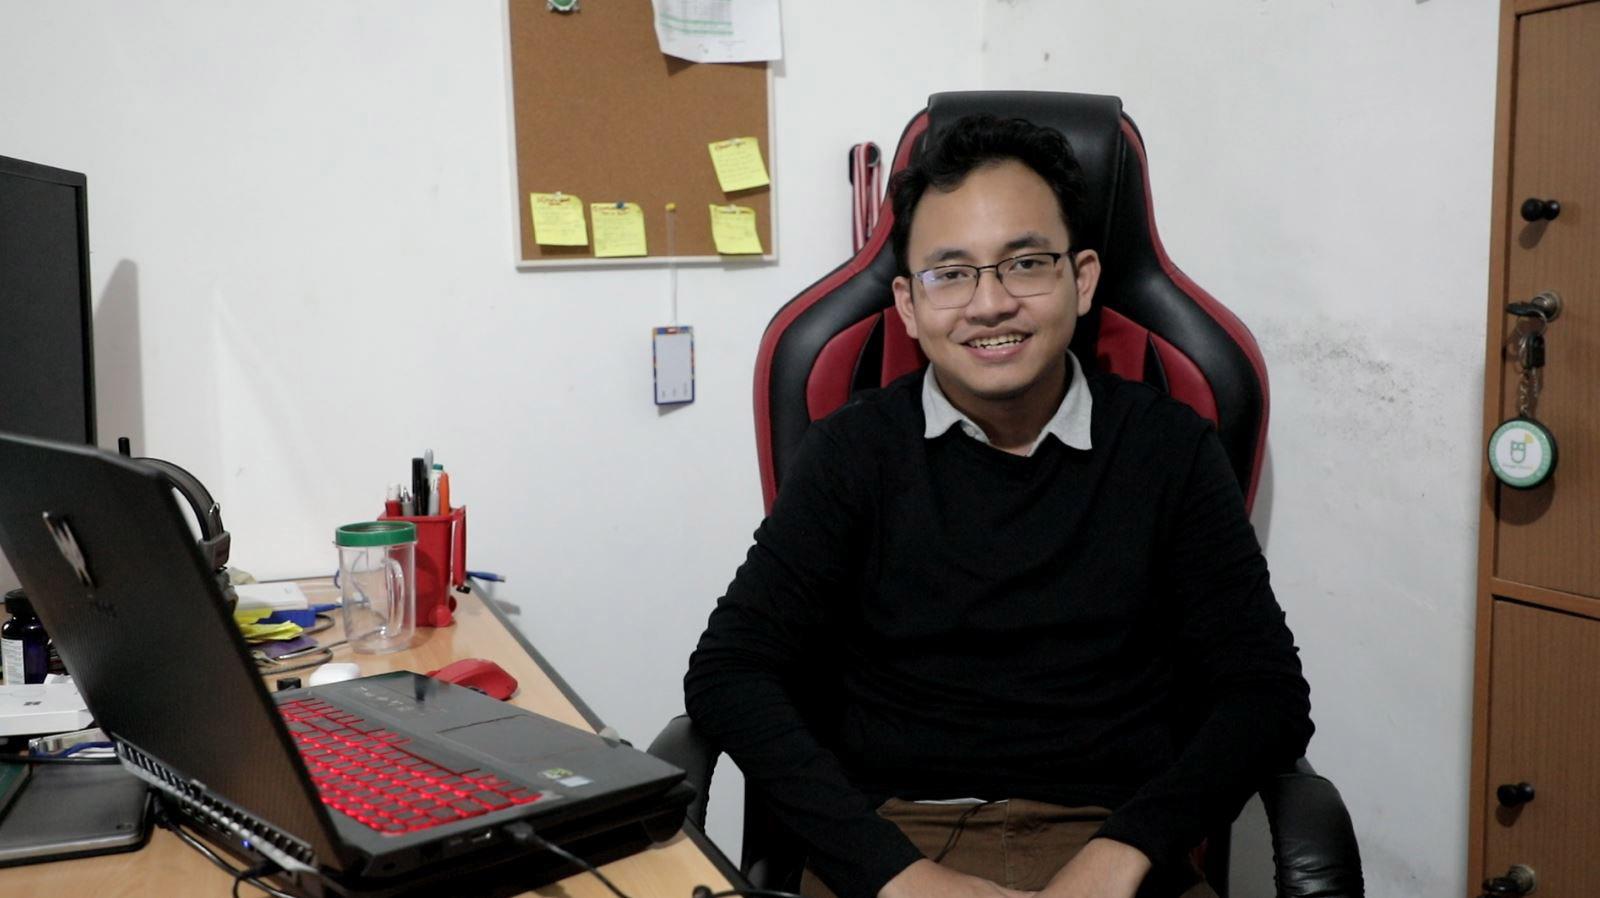 Aryo Febrian Moedanton, Dirikan Anakmuda.net untuk Wadah Berjejaring dan Berkreatif